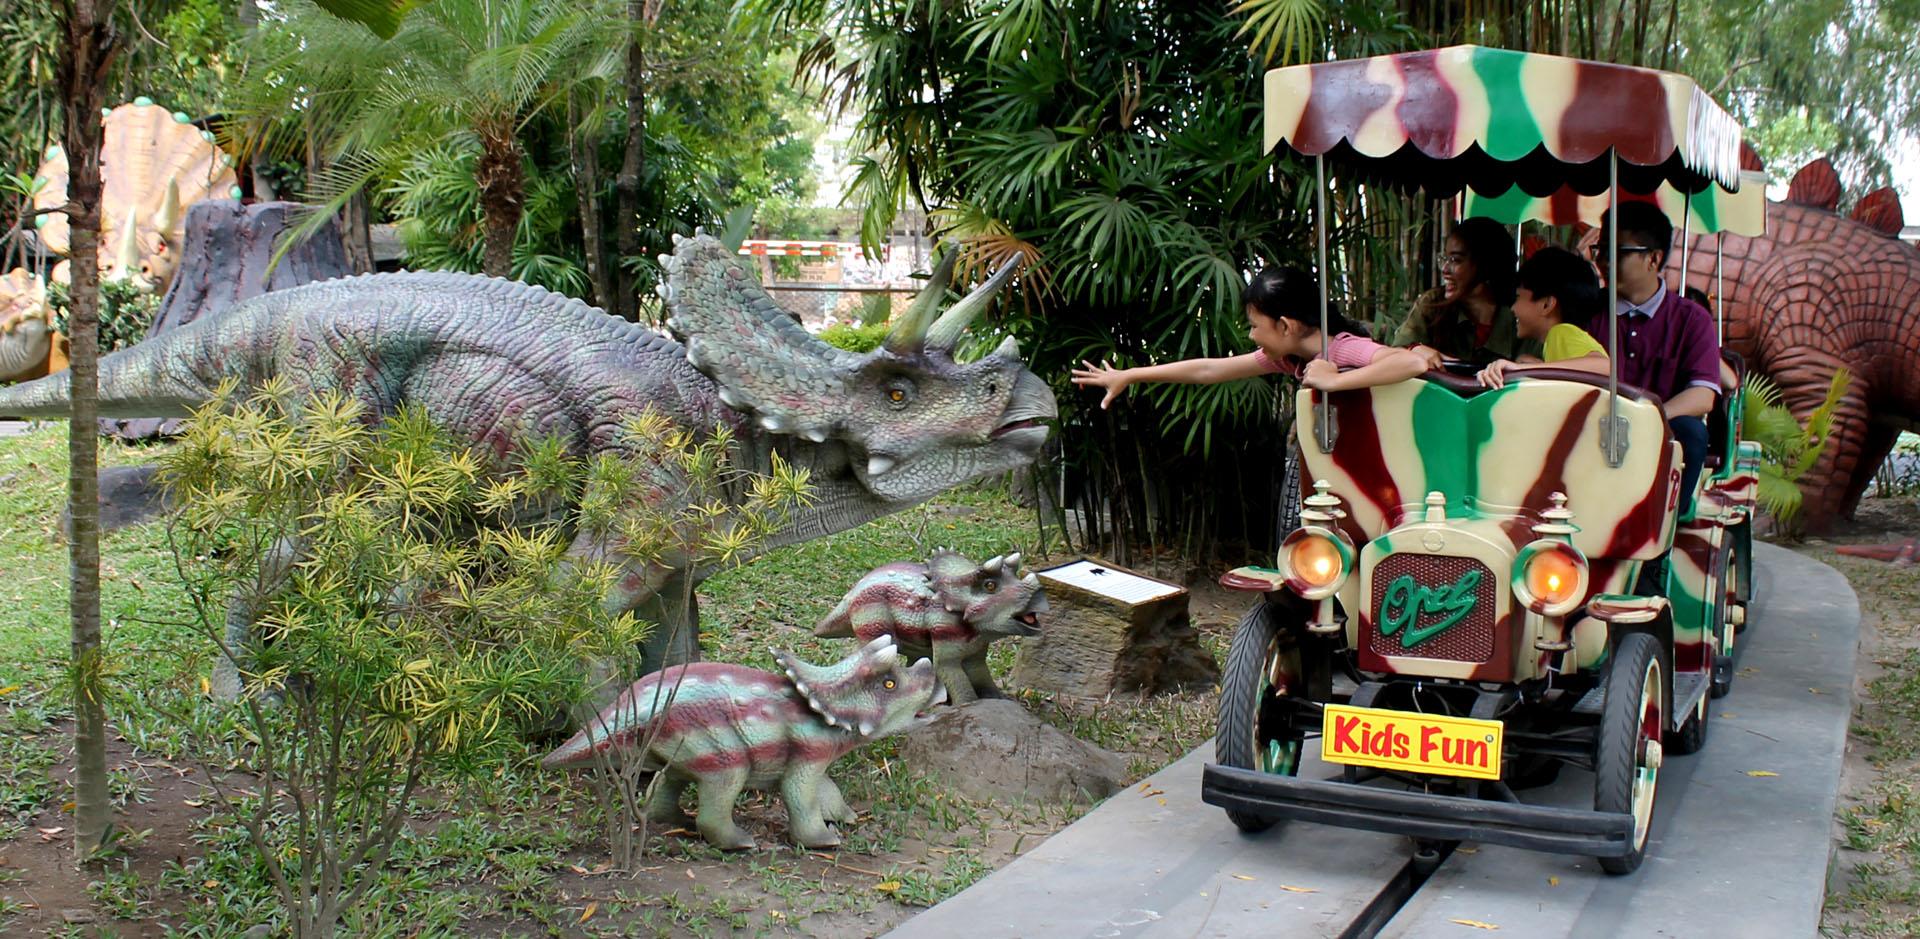 kidsfun-rides